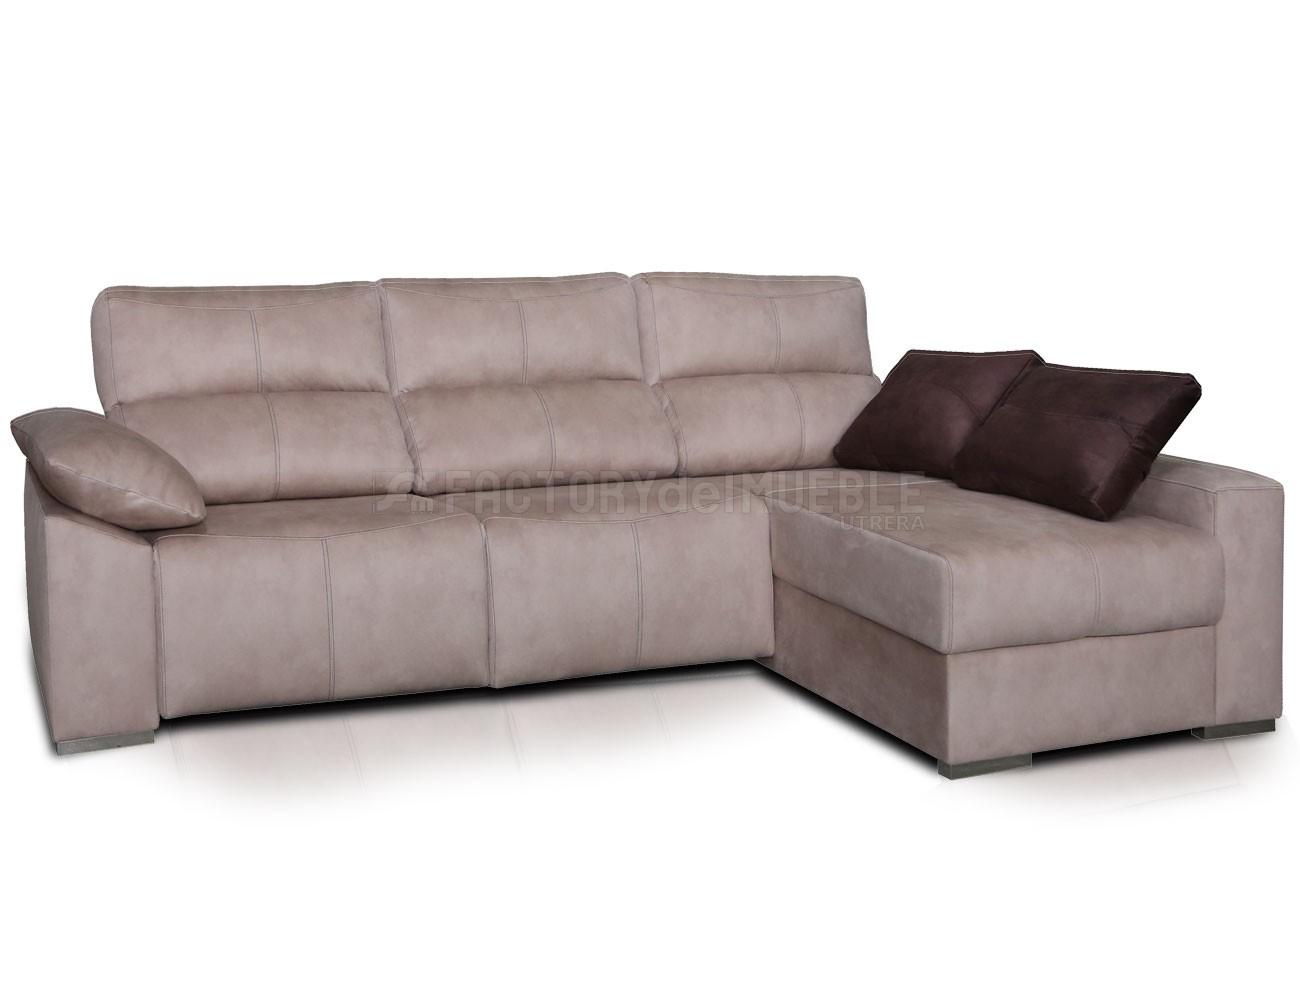 Sofa chaiselongue relax electrico